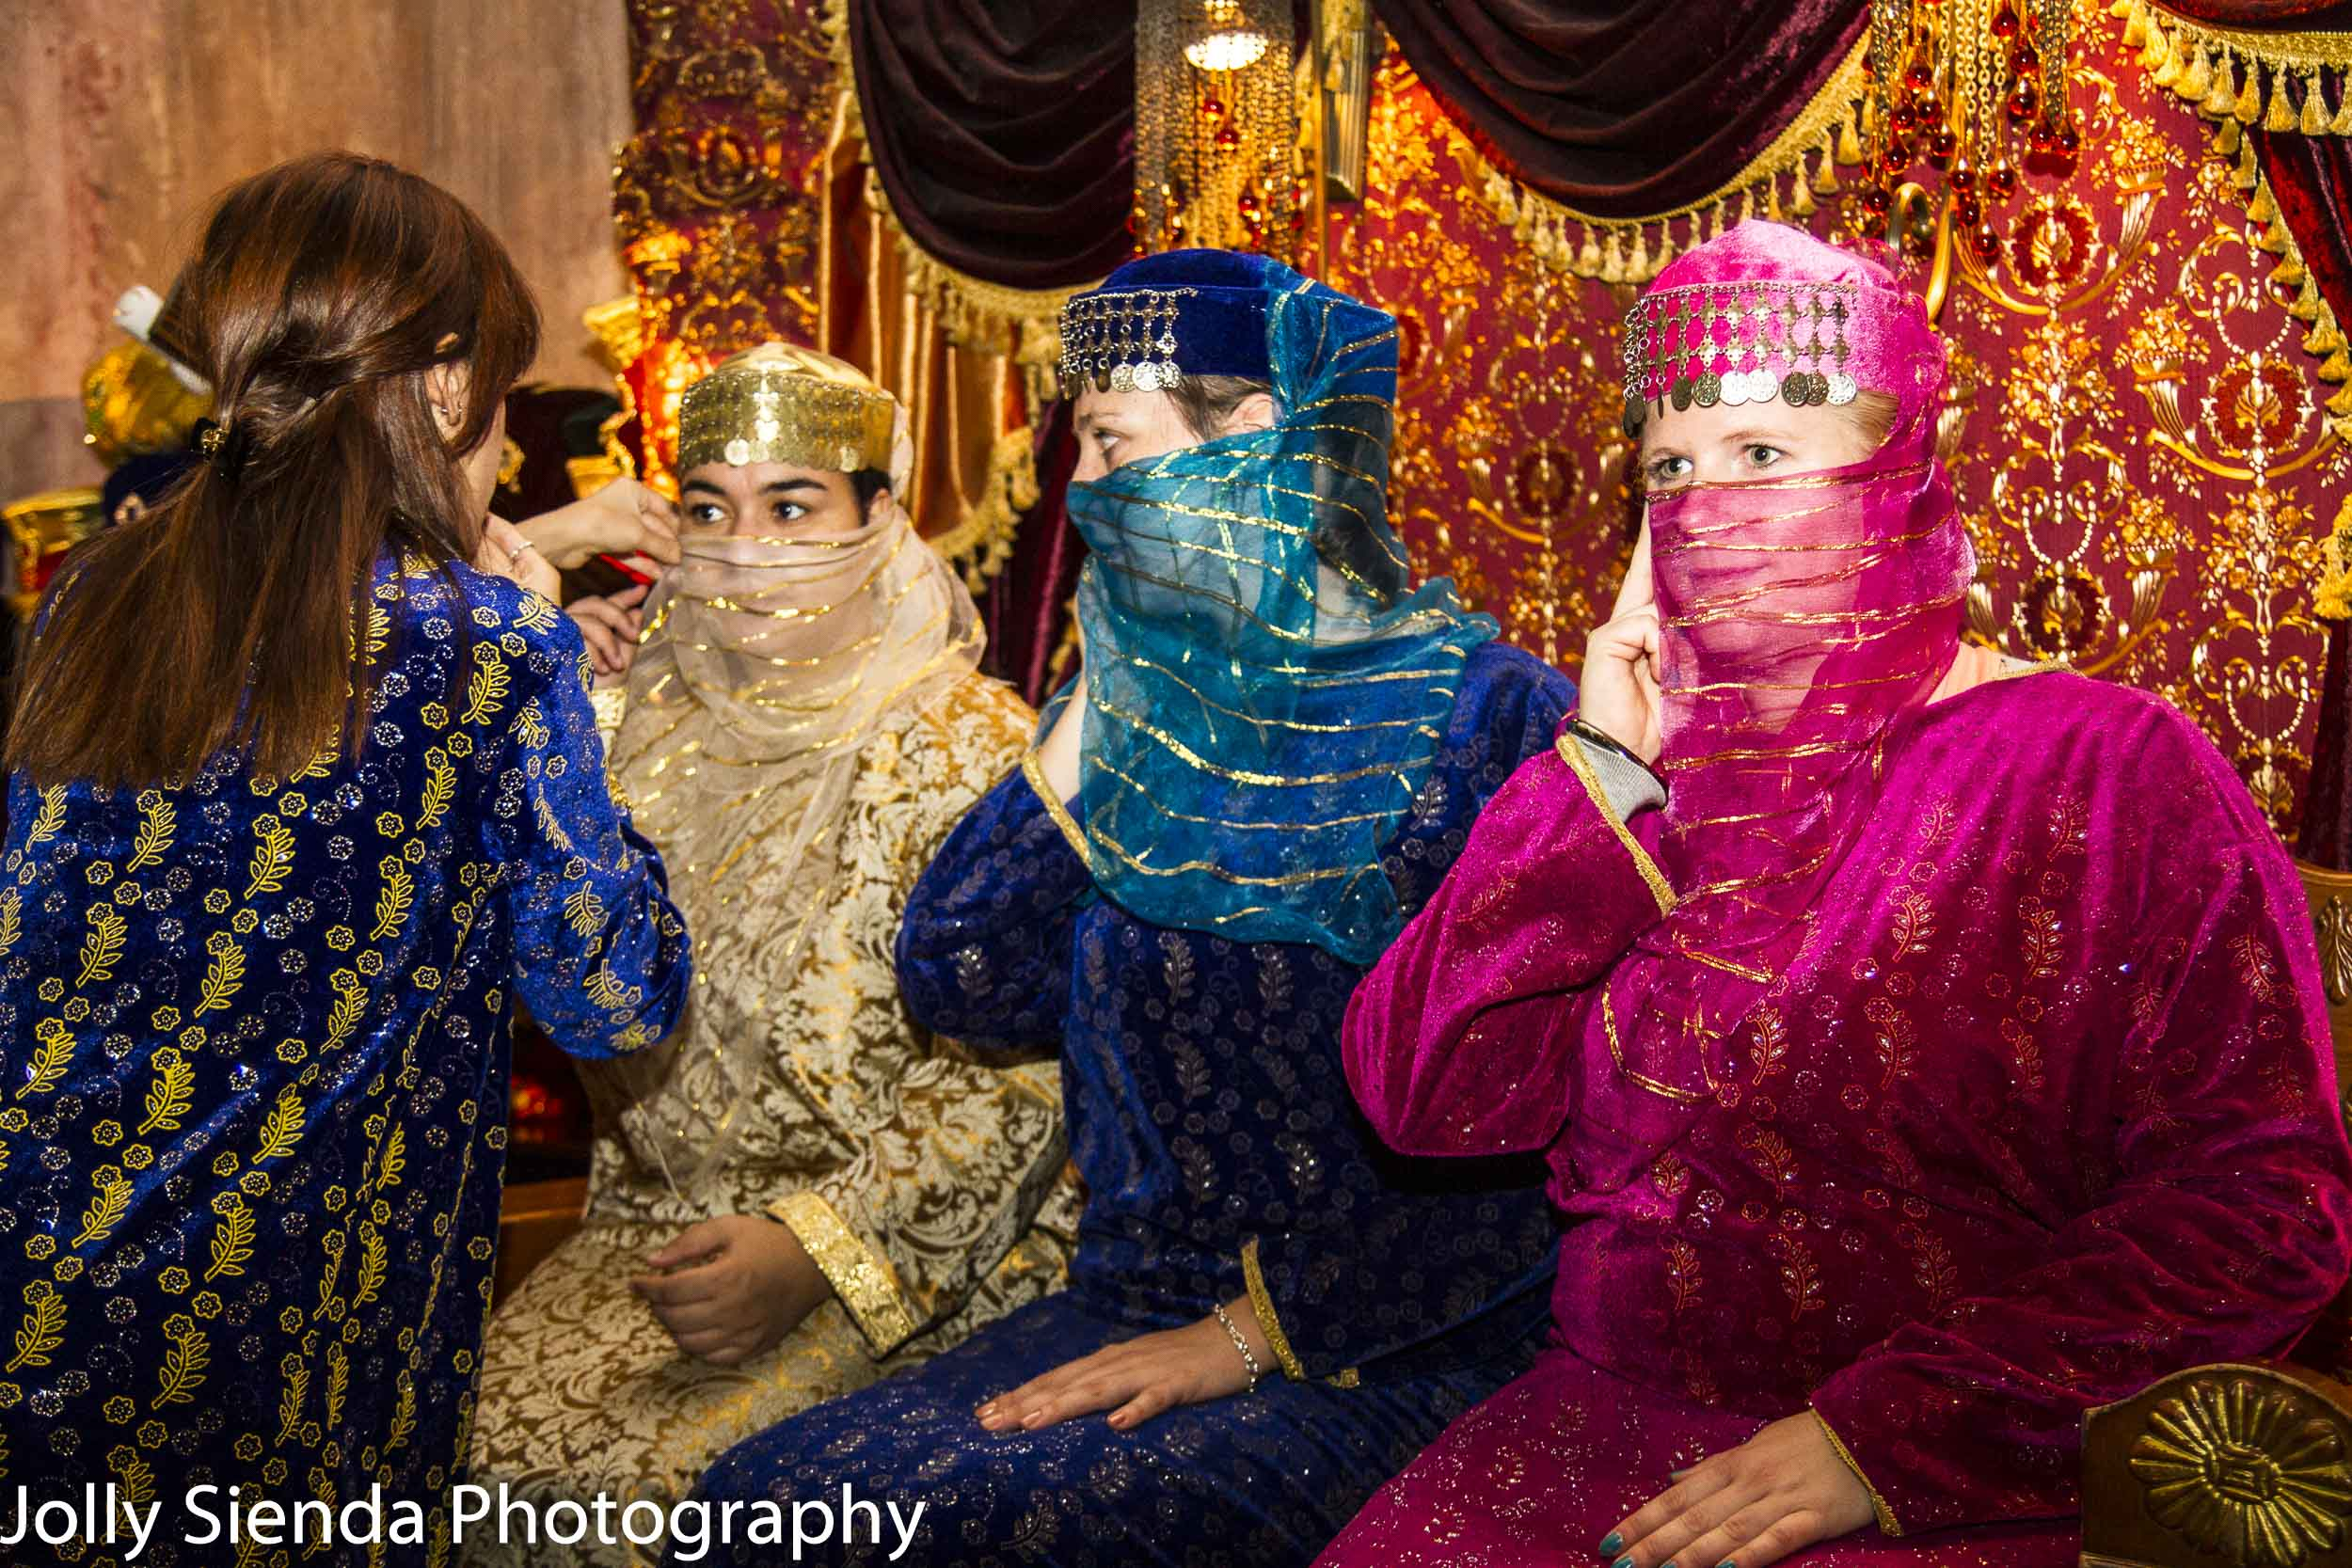 Women wearing colorful abayas